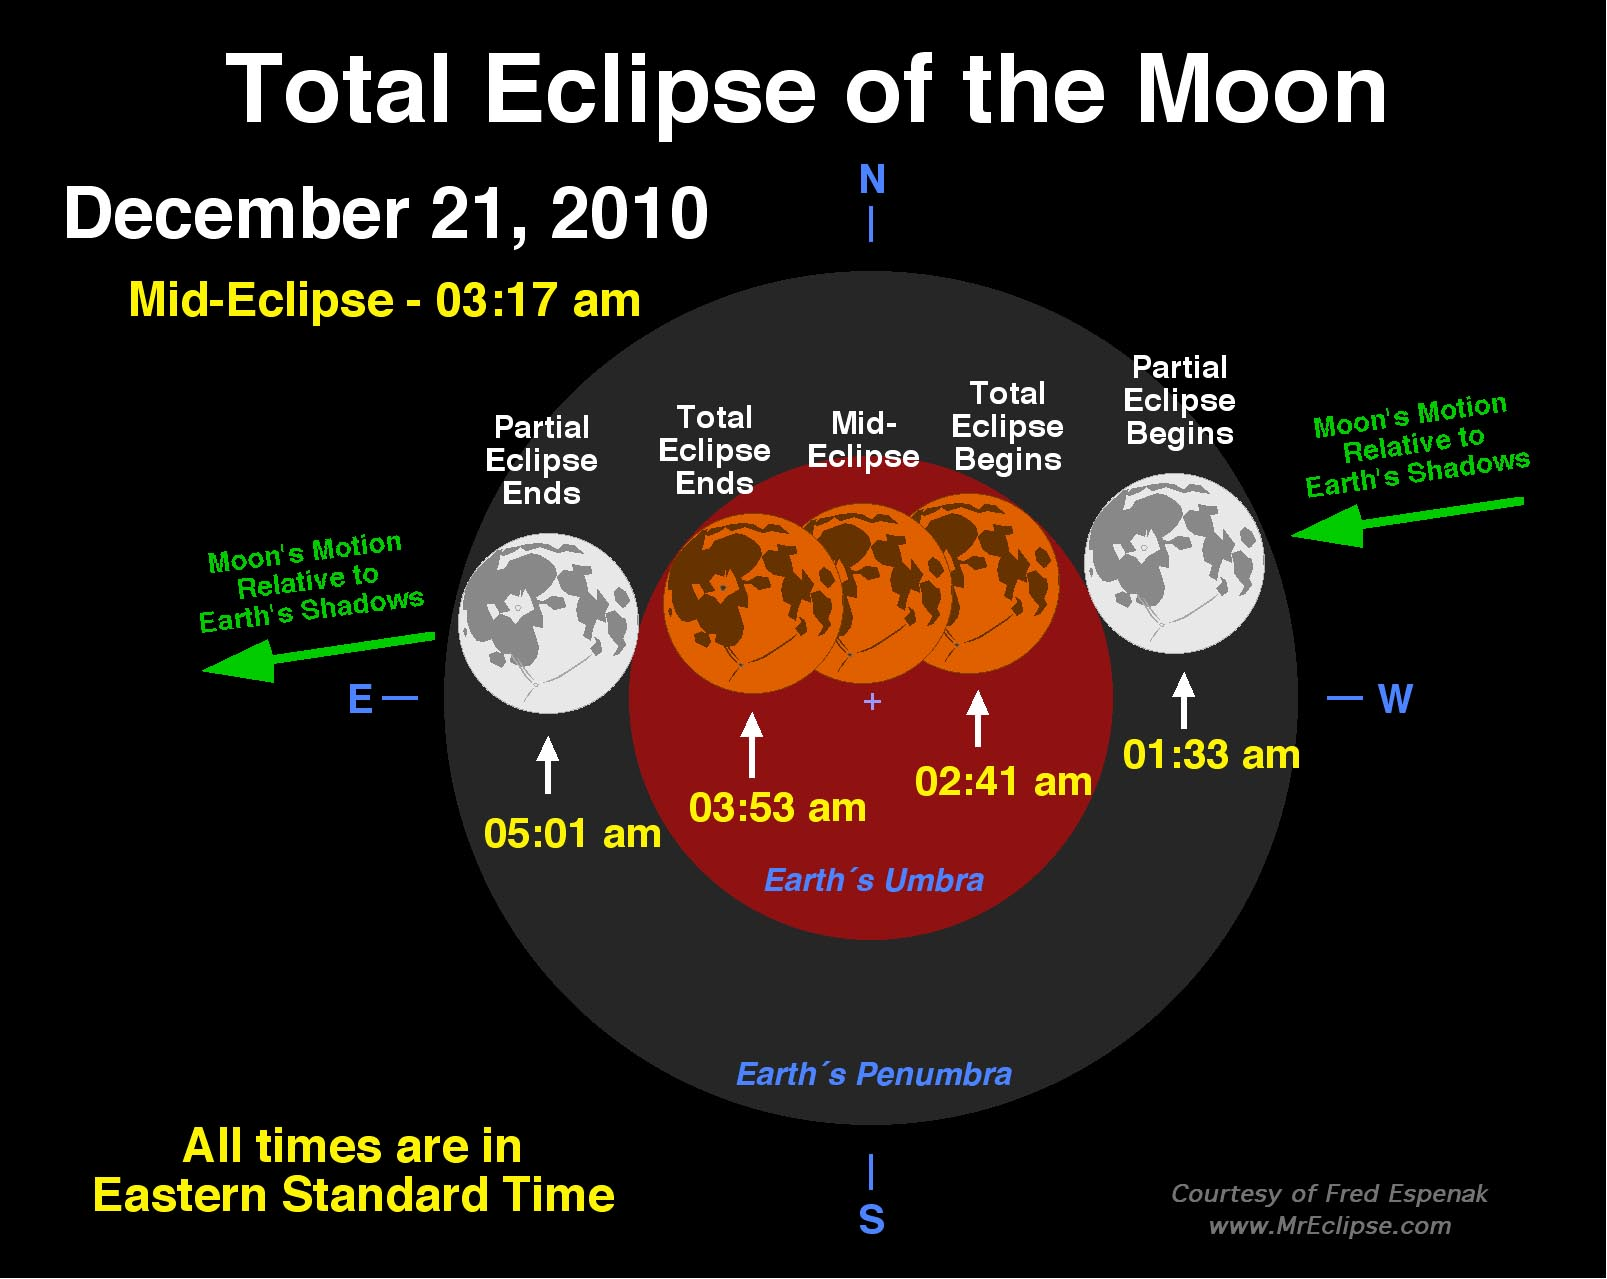 NASA Lunar Eclipse Calendar - Pics about space